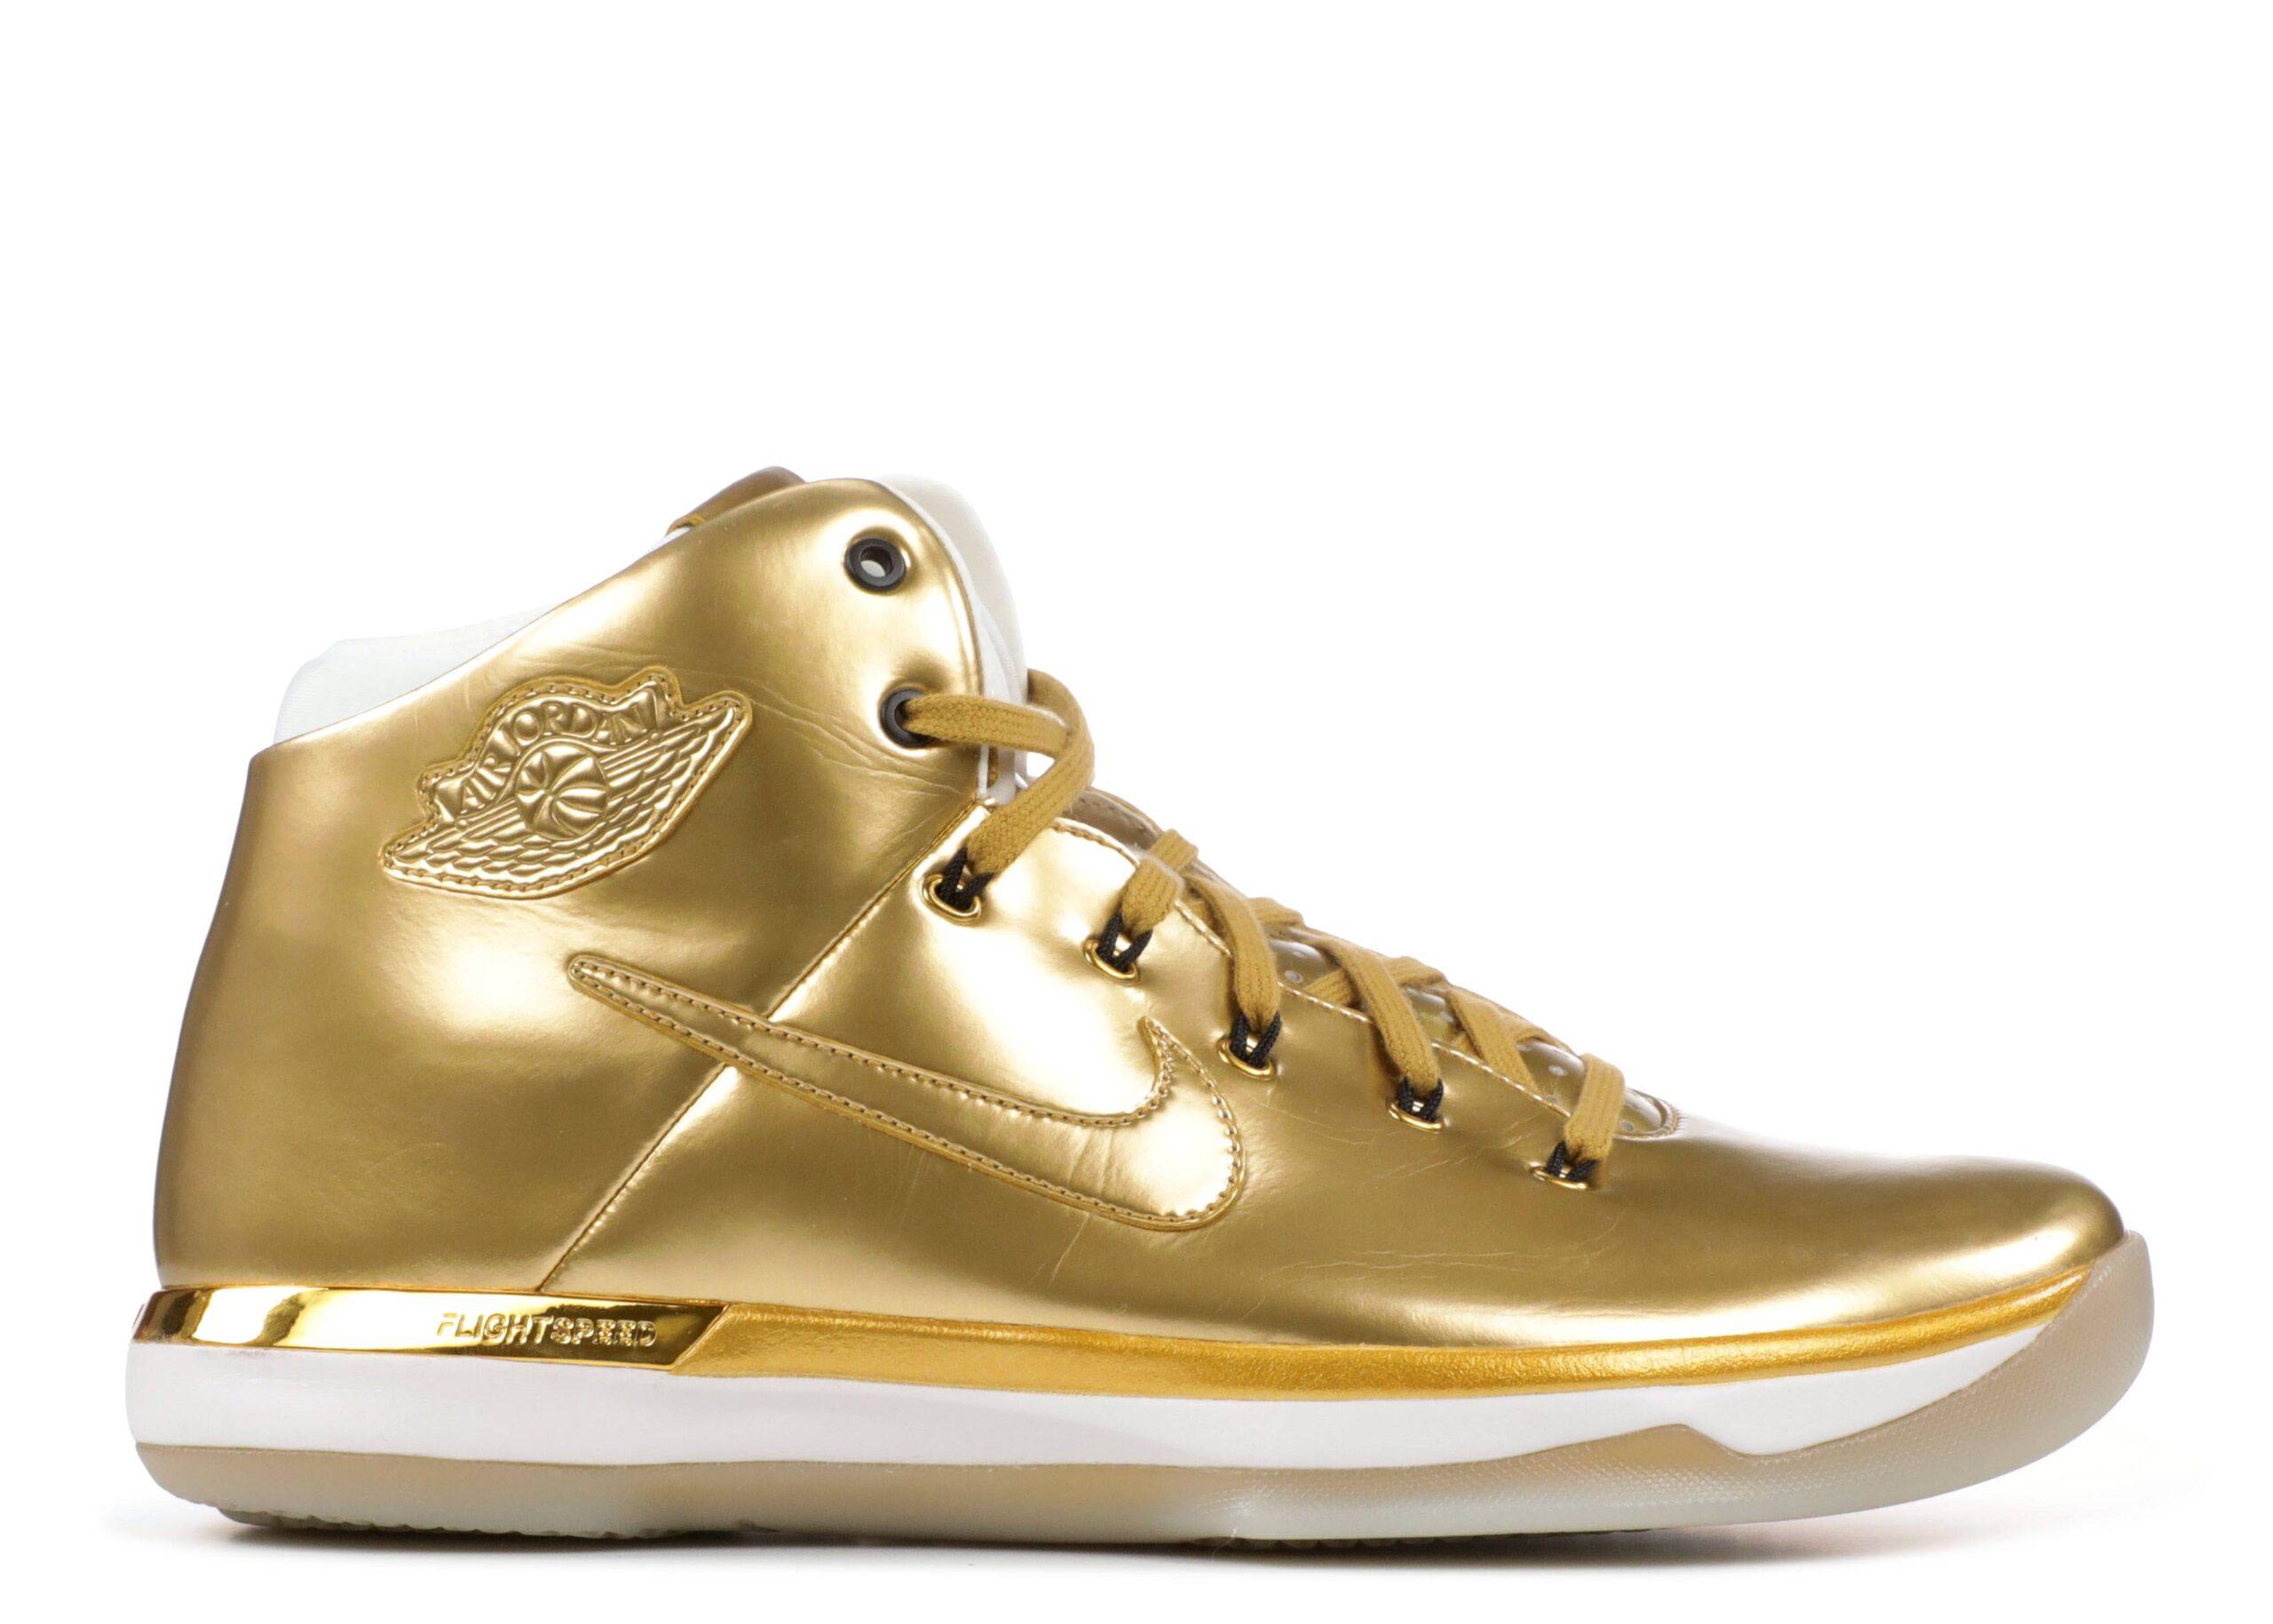 diccionario Compra decidir  The 10 Rarest & Coolest Nike Air Jordan Sneakers | Fortress of Solitude